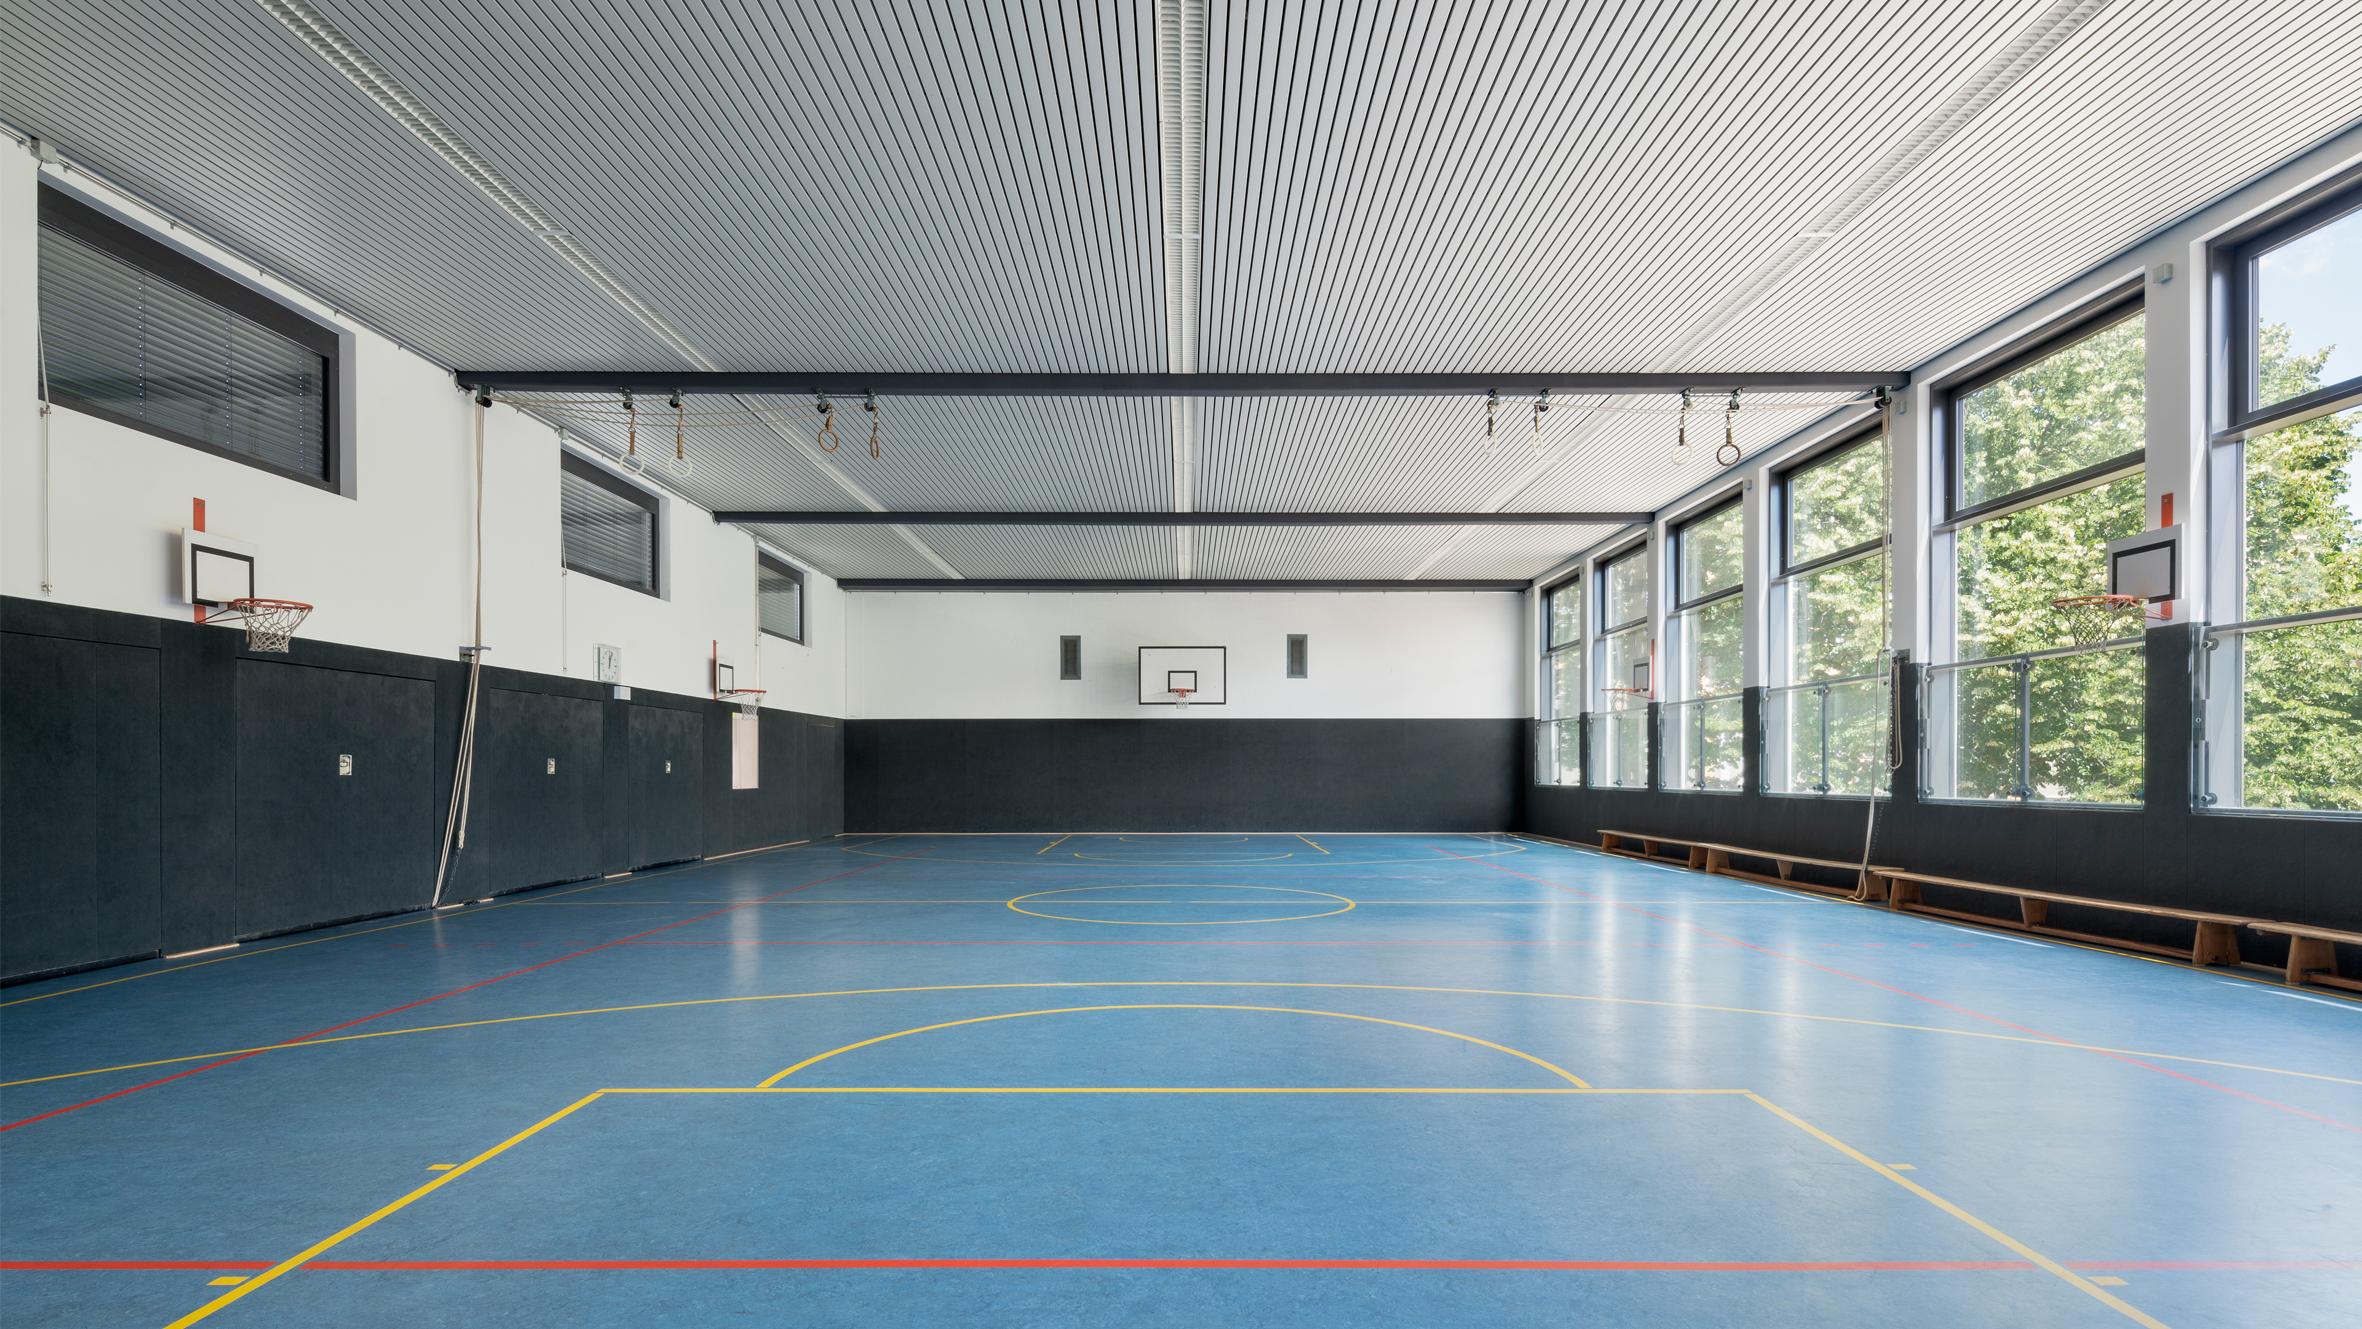 Architekt Bonn Sanierung Josefschule Bonn-Beuel Koenigs Rütter Architekten